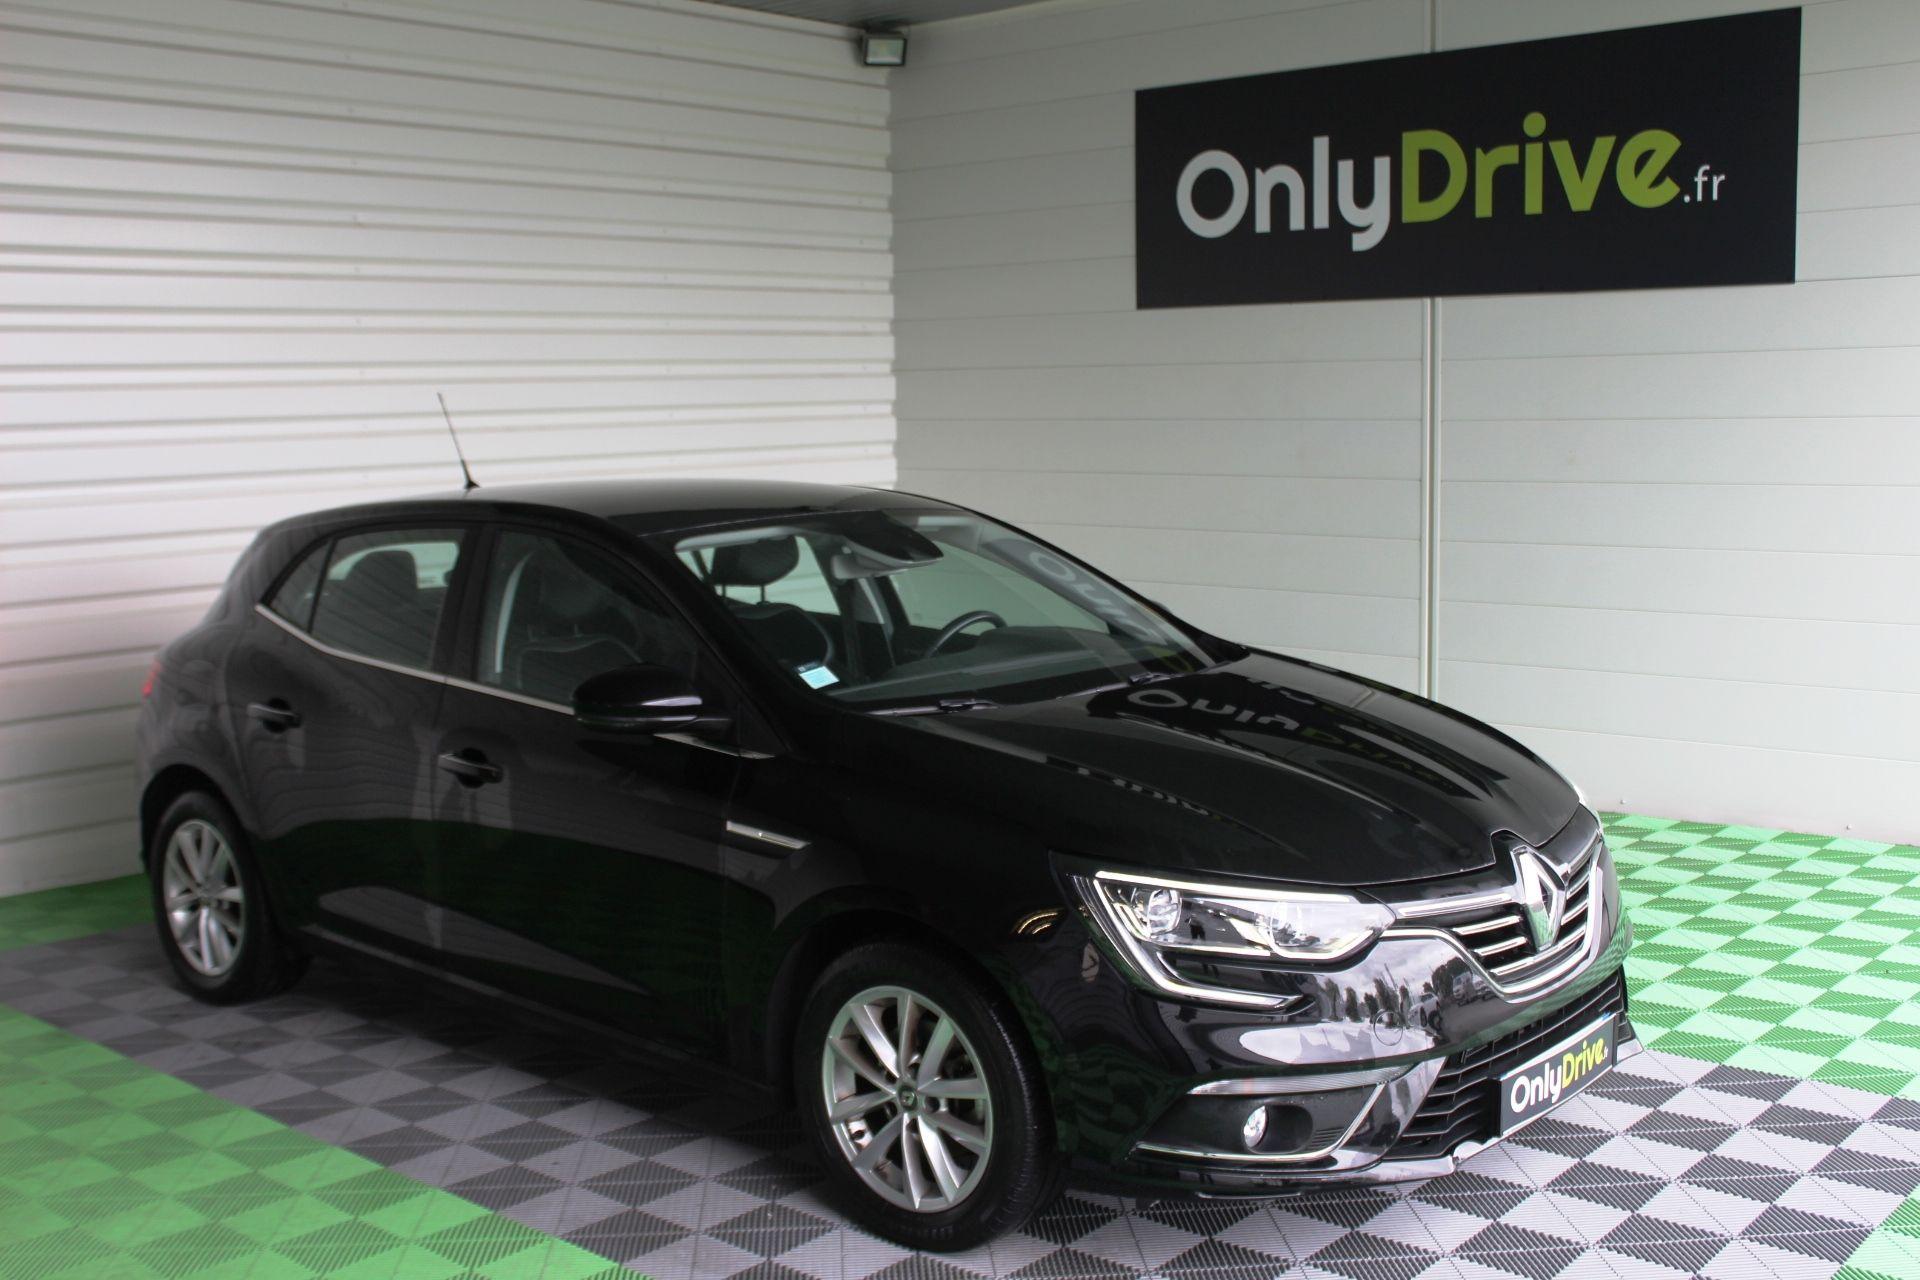 Renault Megane IV 1.5 dCi 110 Energy Intens, Noir, 2017 ...